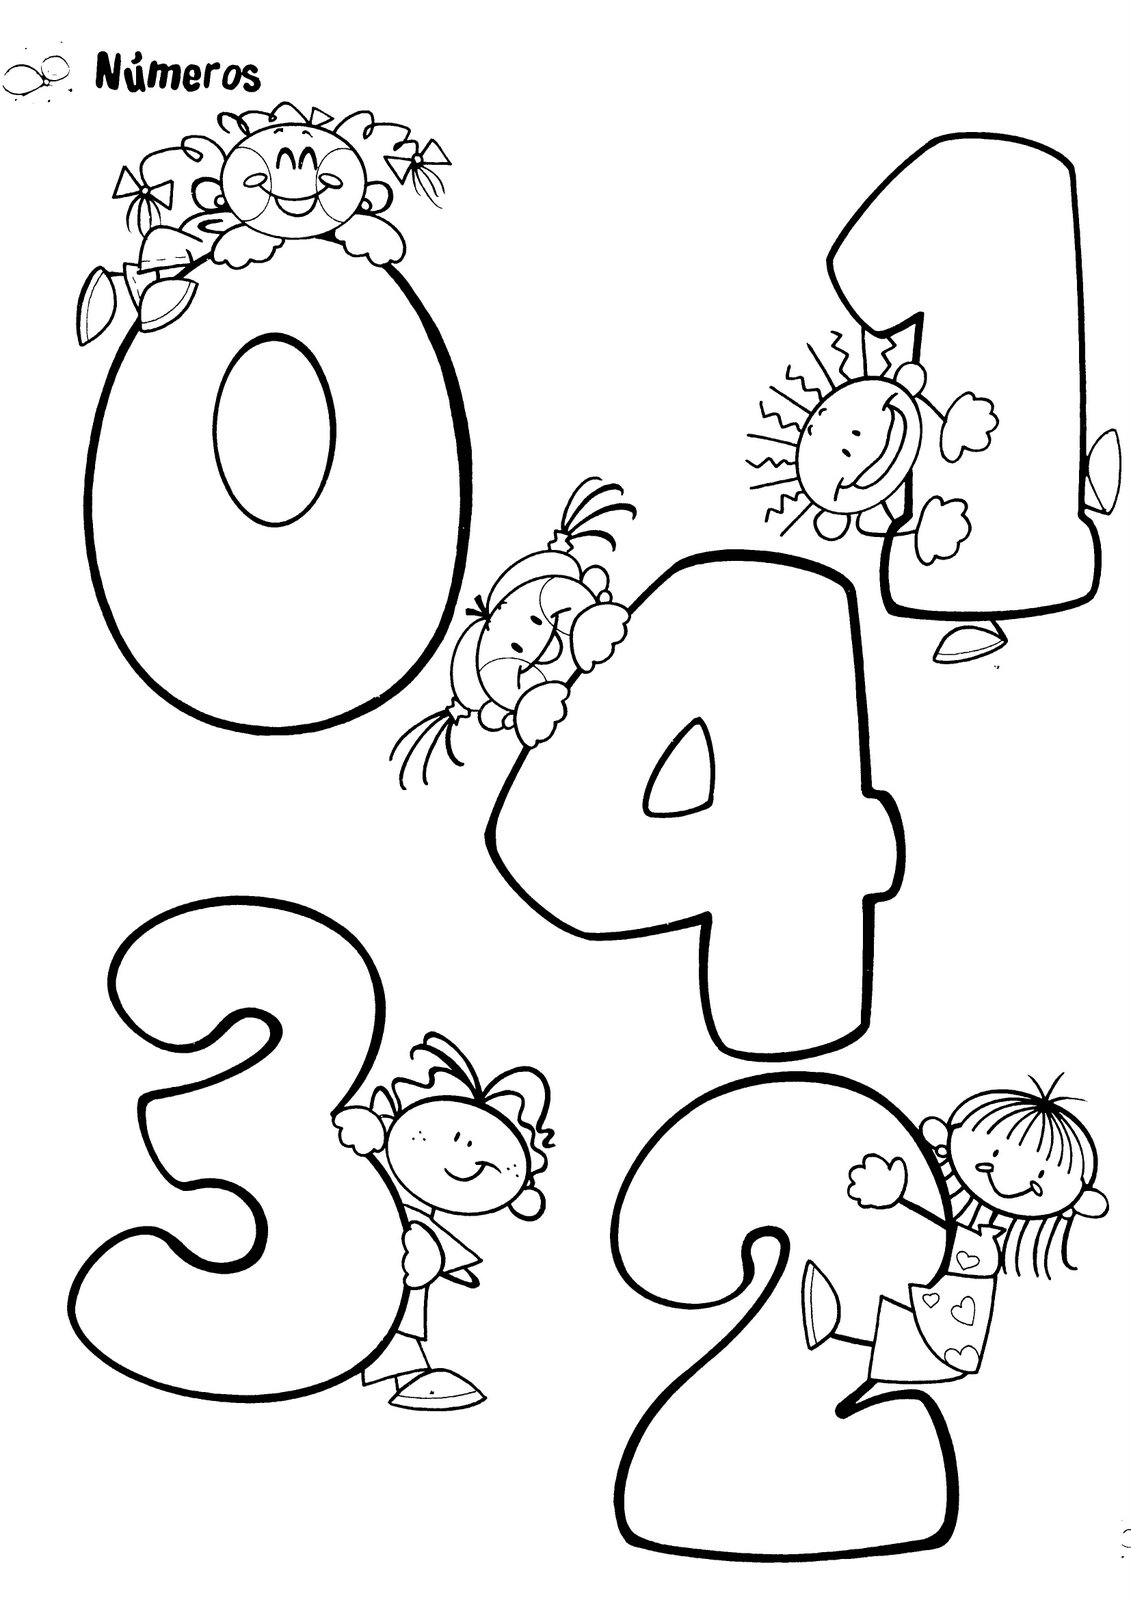 Dibujos Para Caratulas De Matematicas Para Secundaria